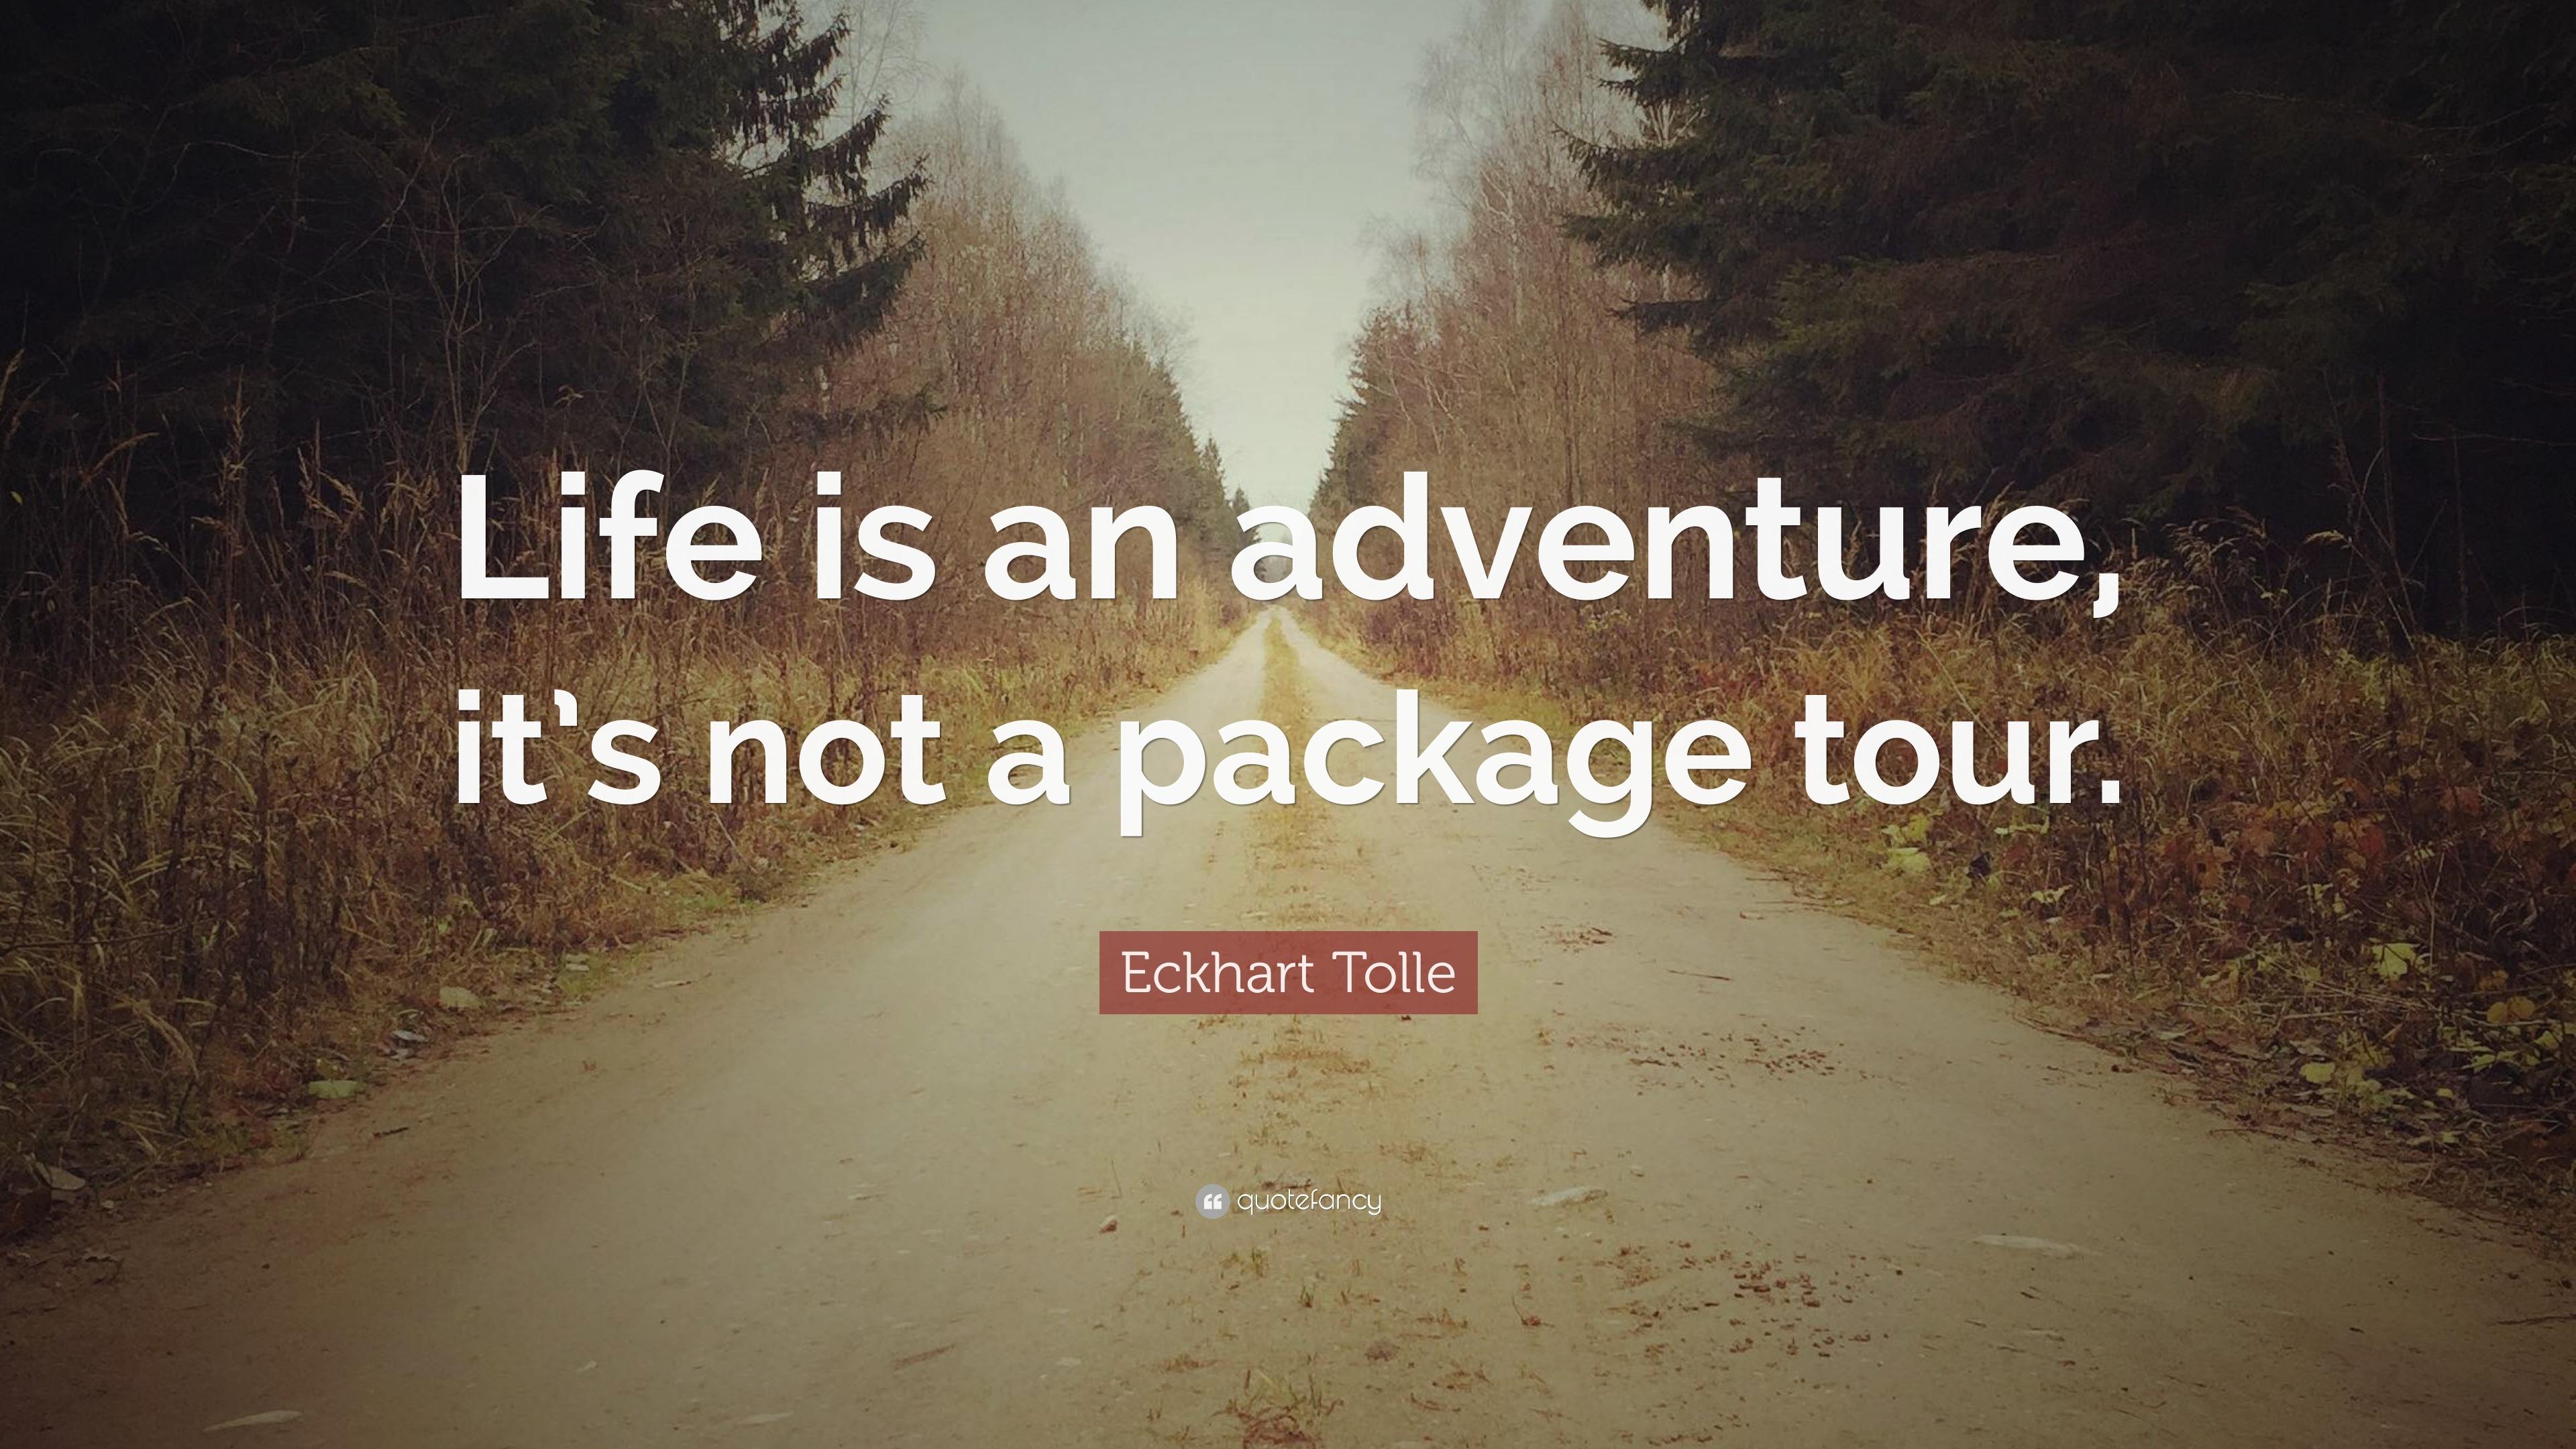 adventure quotes (39 wallpapers) - quotefancy